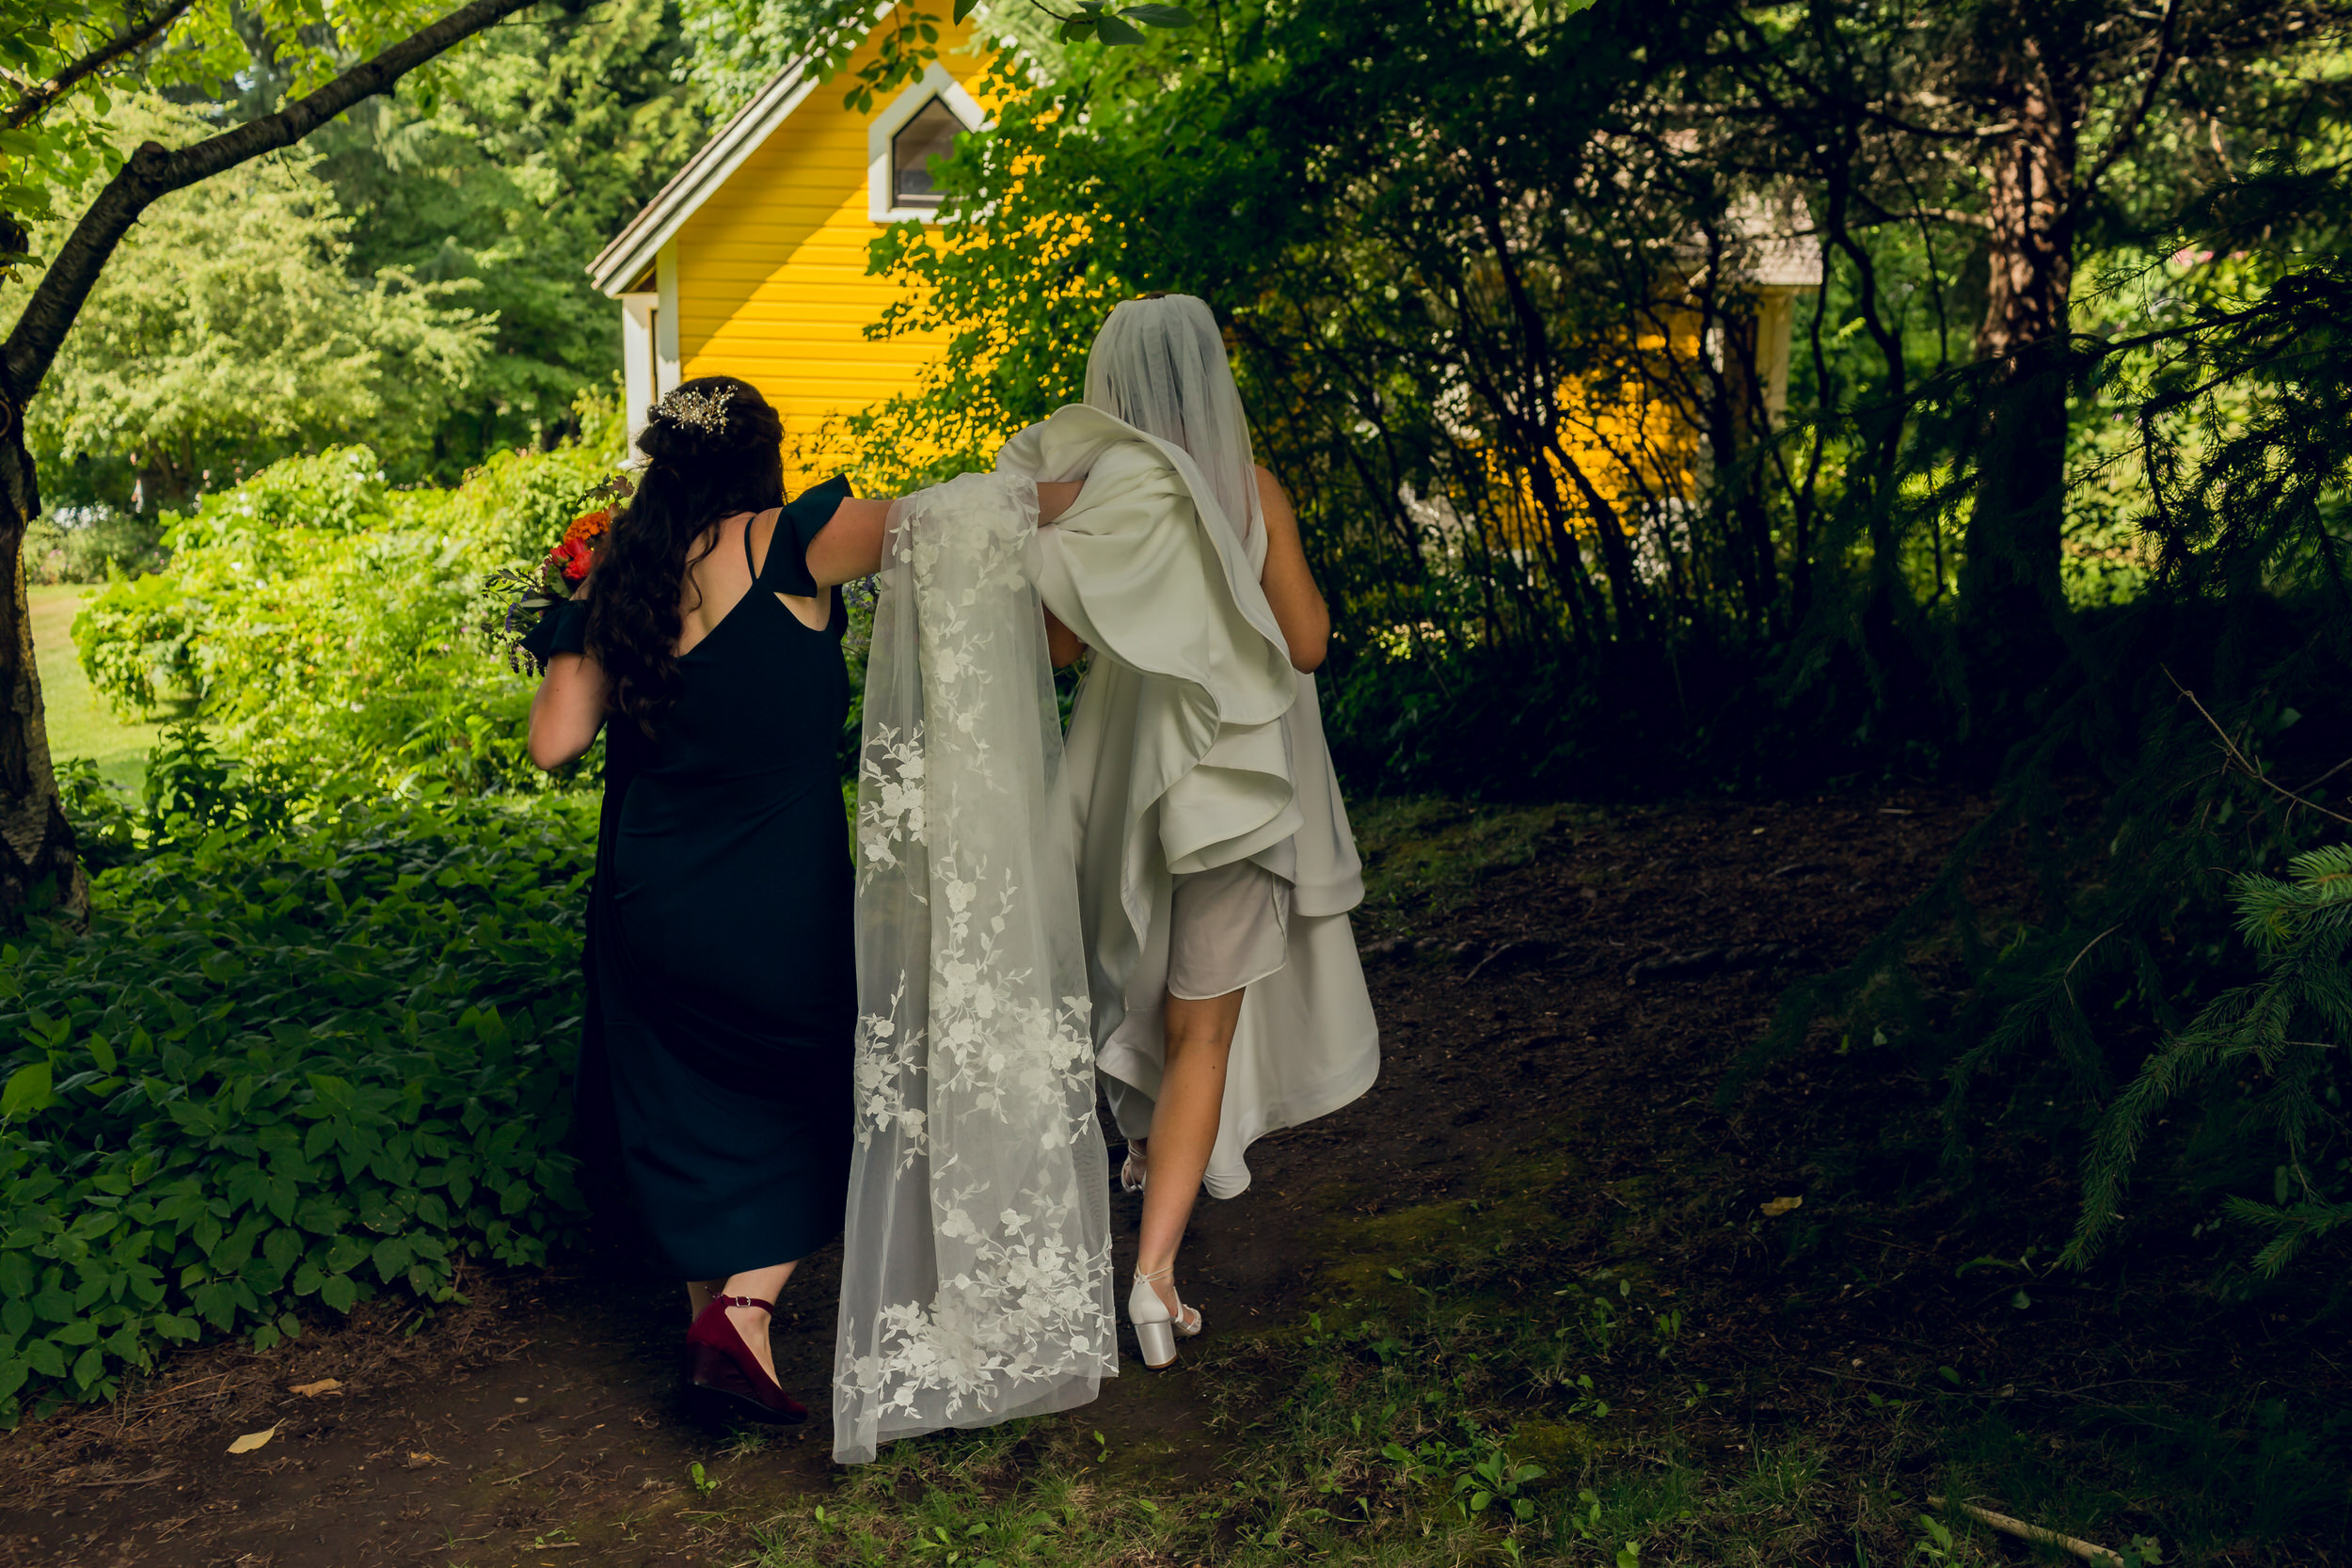 mthoodorganicfarms_wedding_BK019_starkphotography